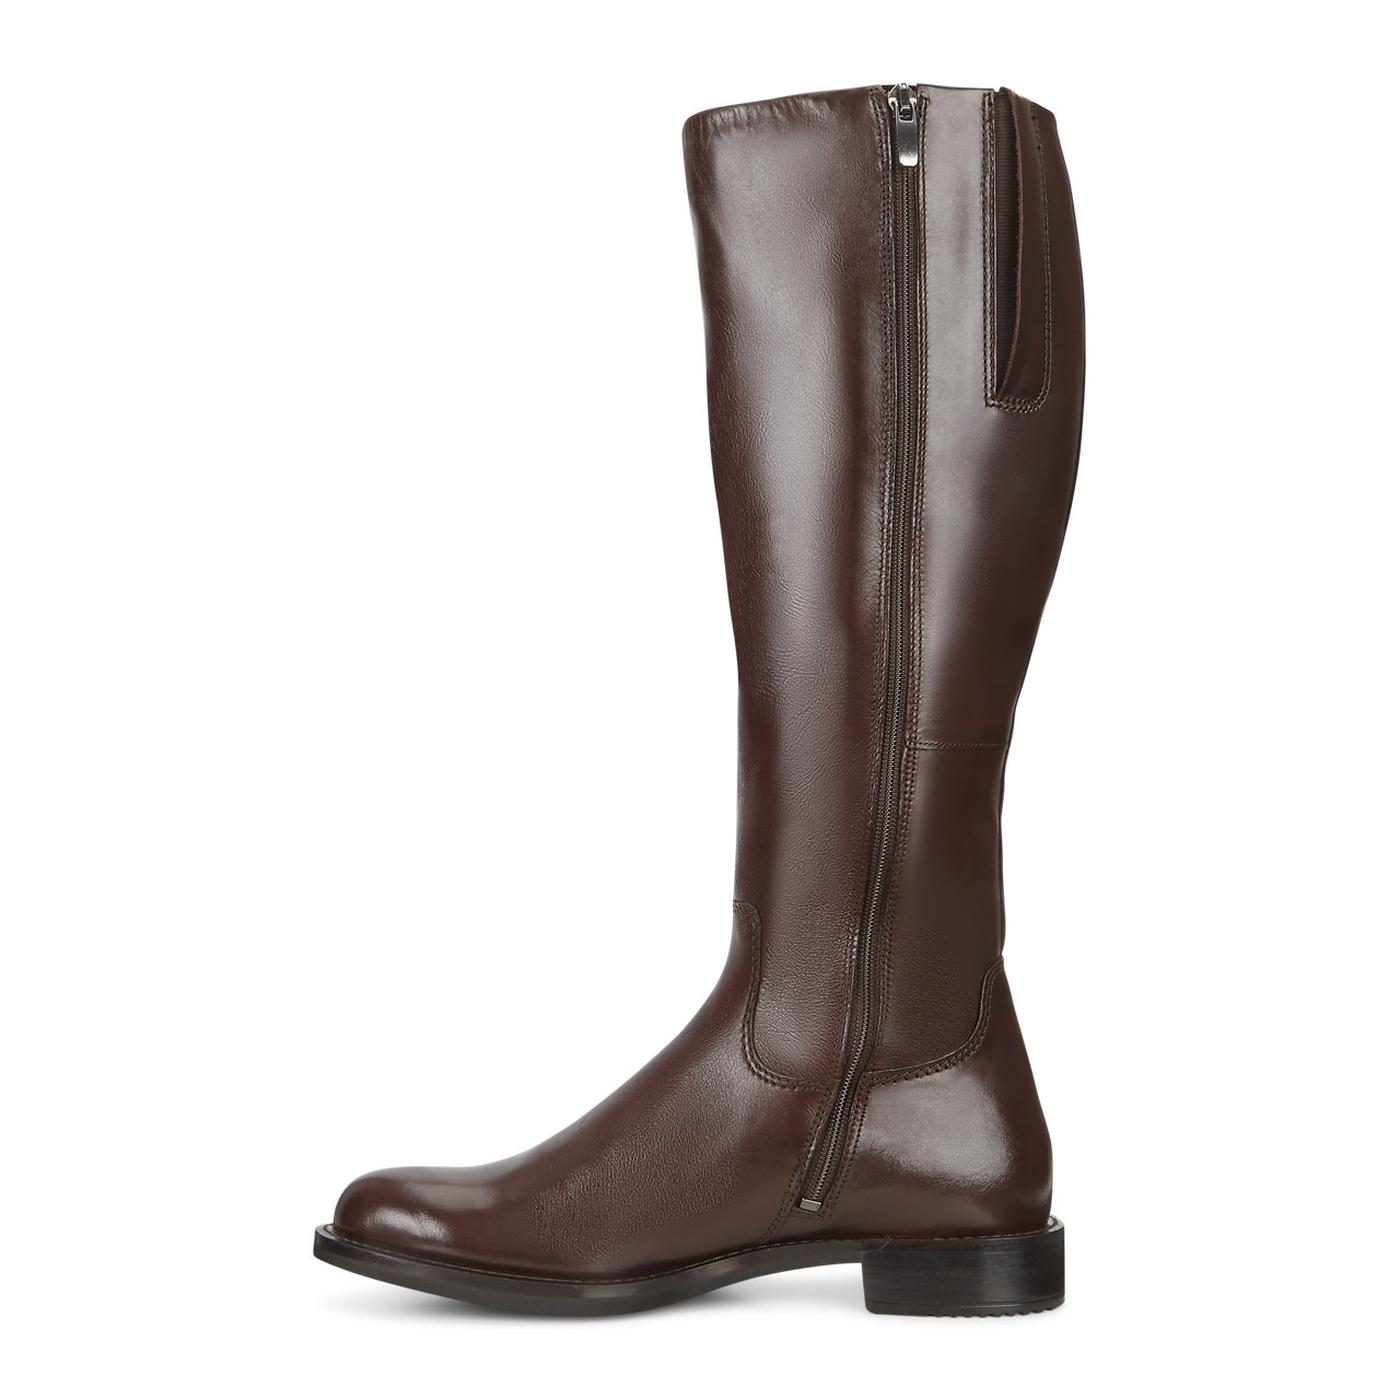 77609b6fb0 ECCO Shape 25 Riding Boot | Women's Formal Boots | ECCO® Shoes